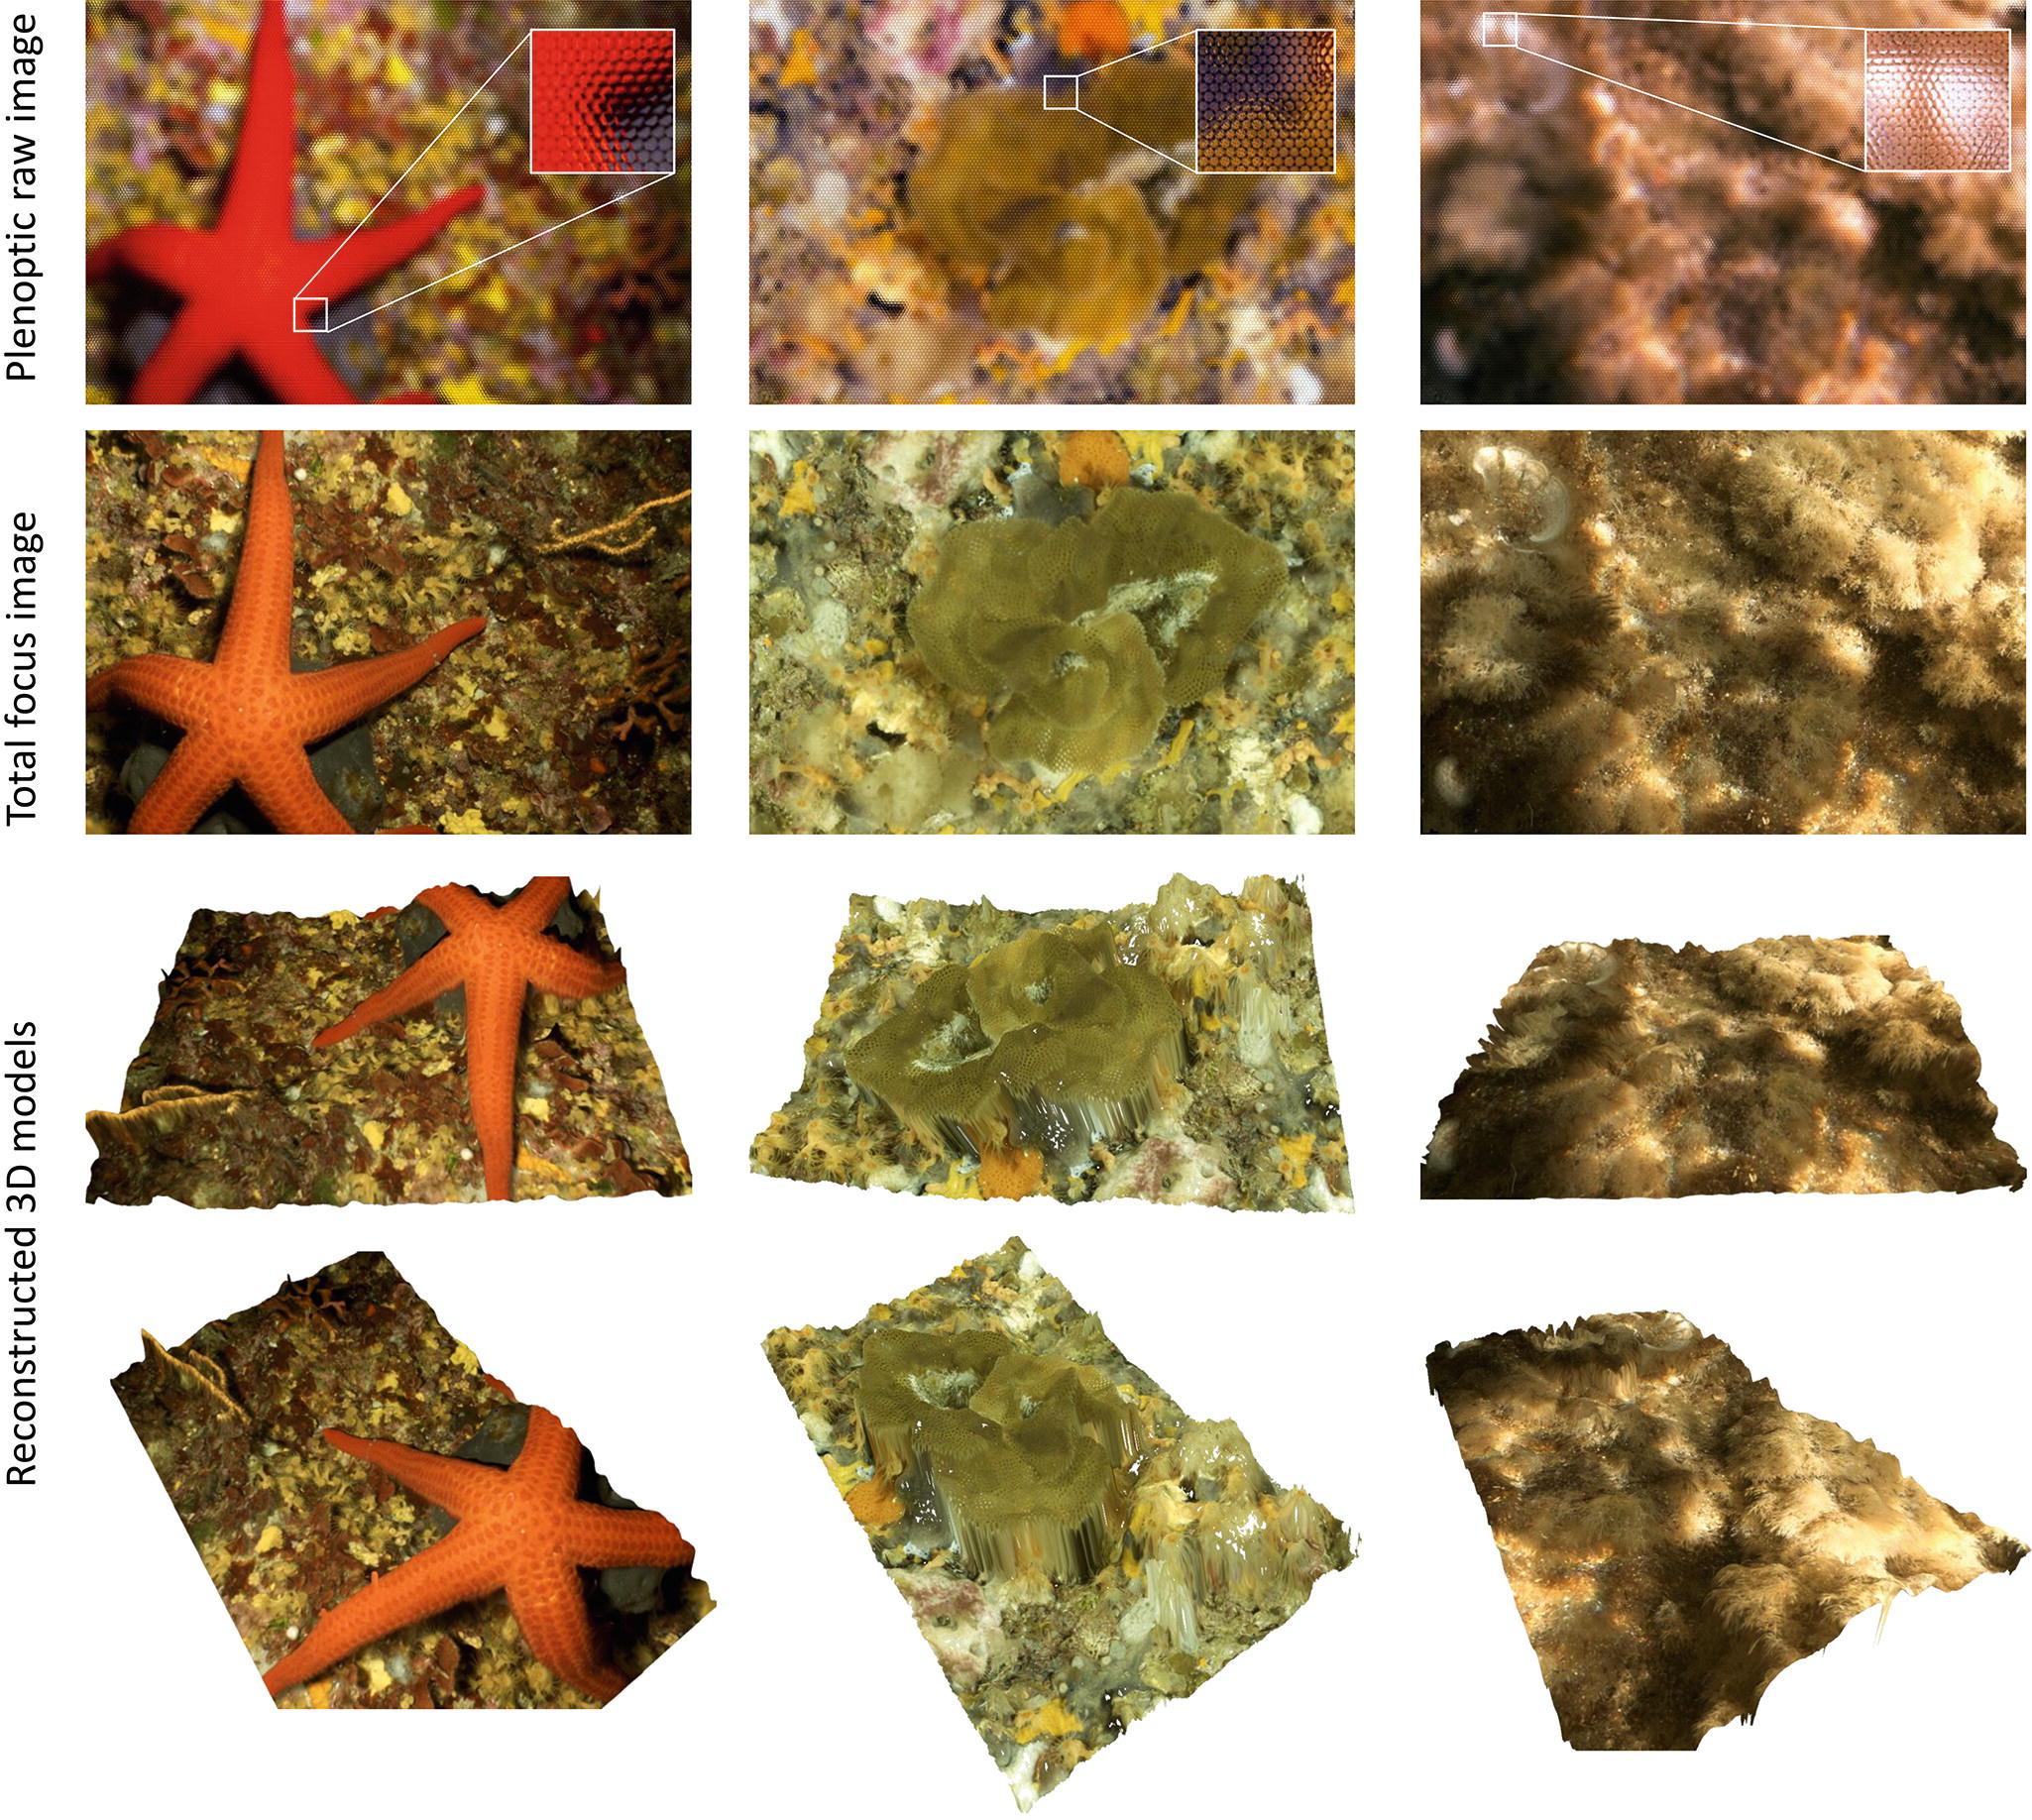 Deepwater Archaeological Survey: An Interdisciplinary and